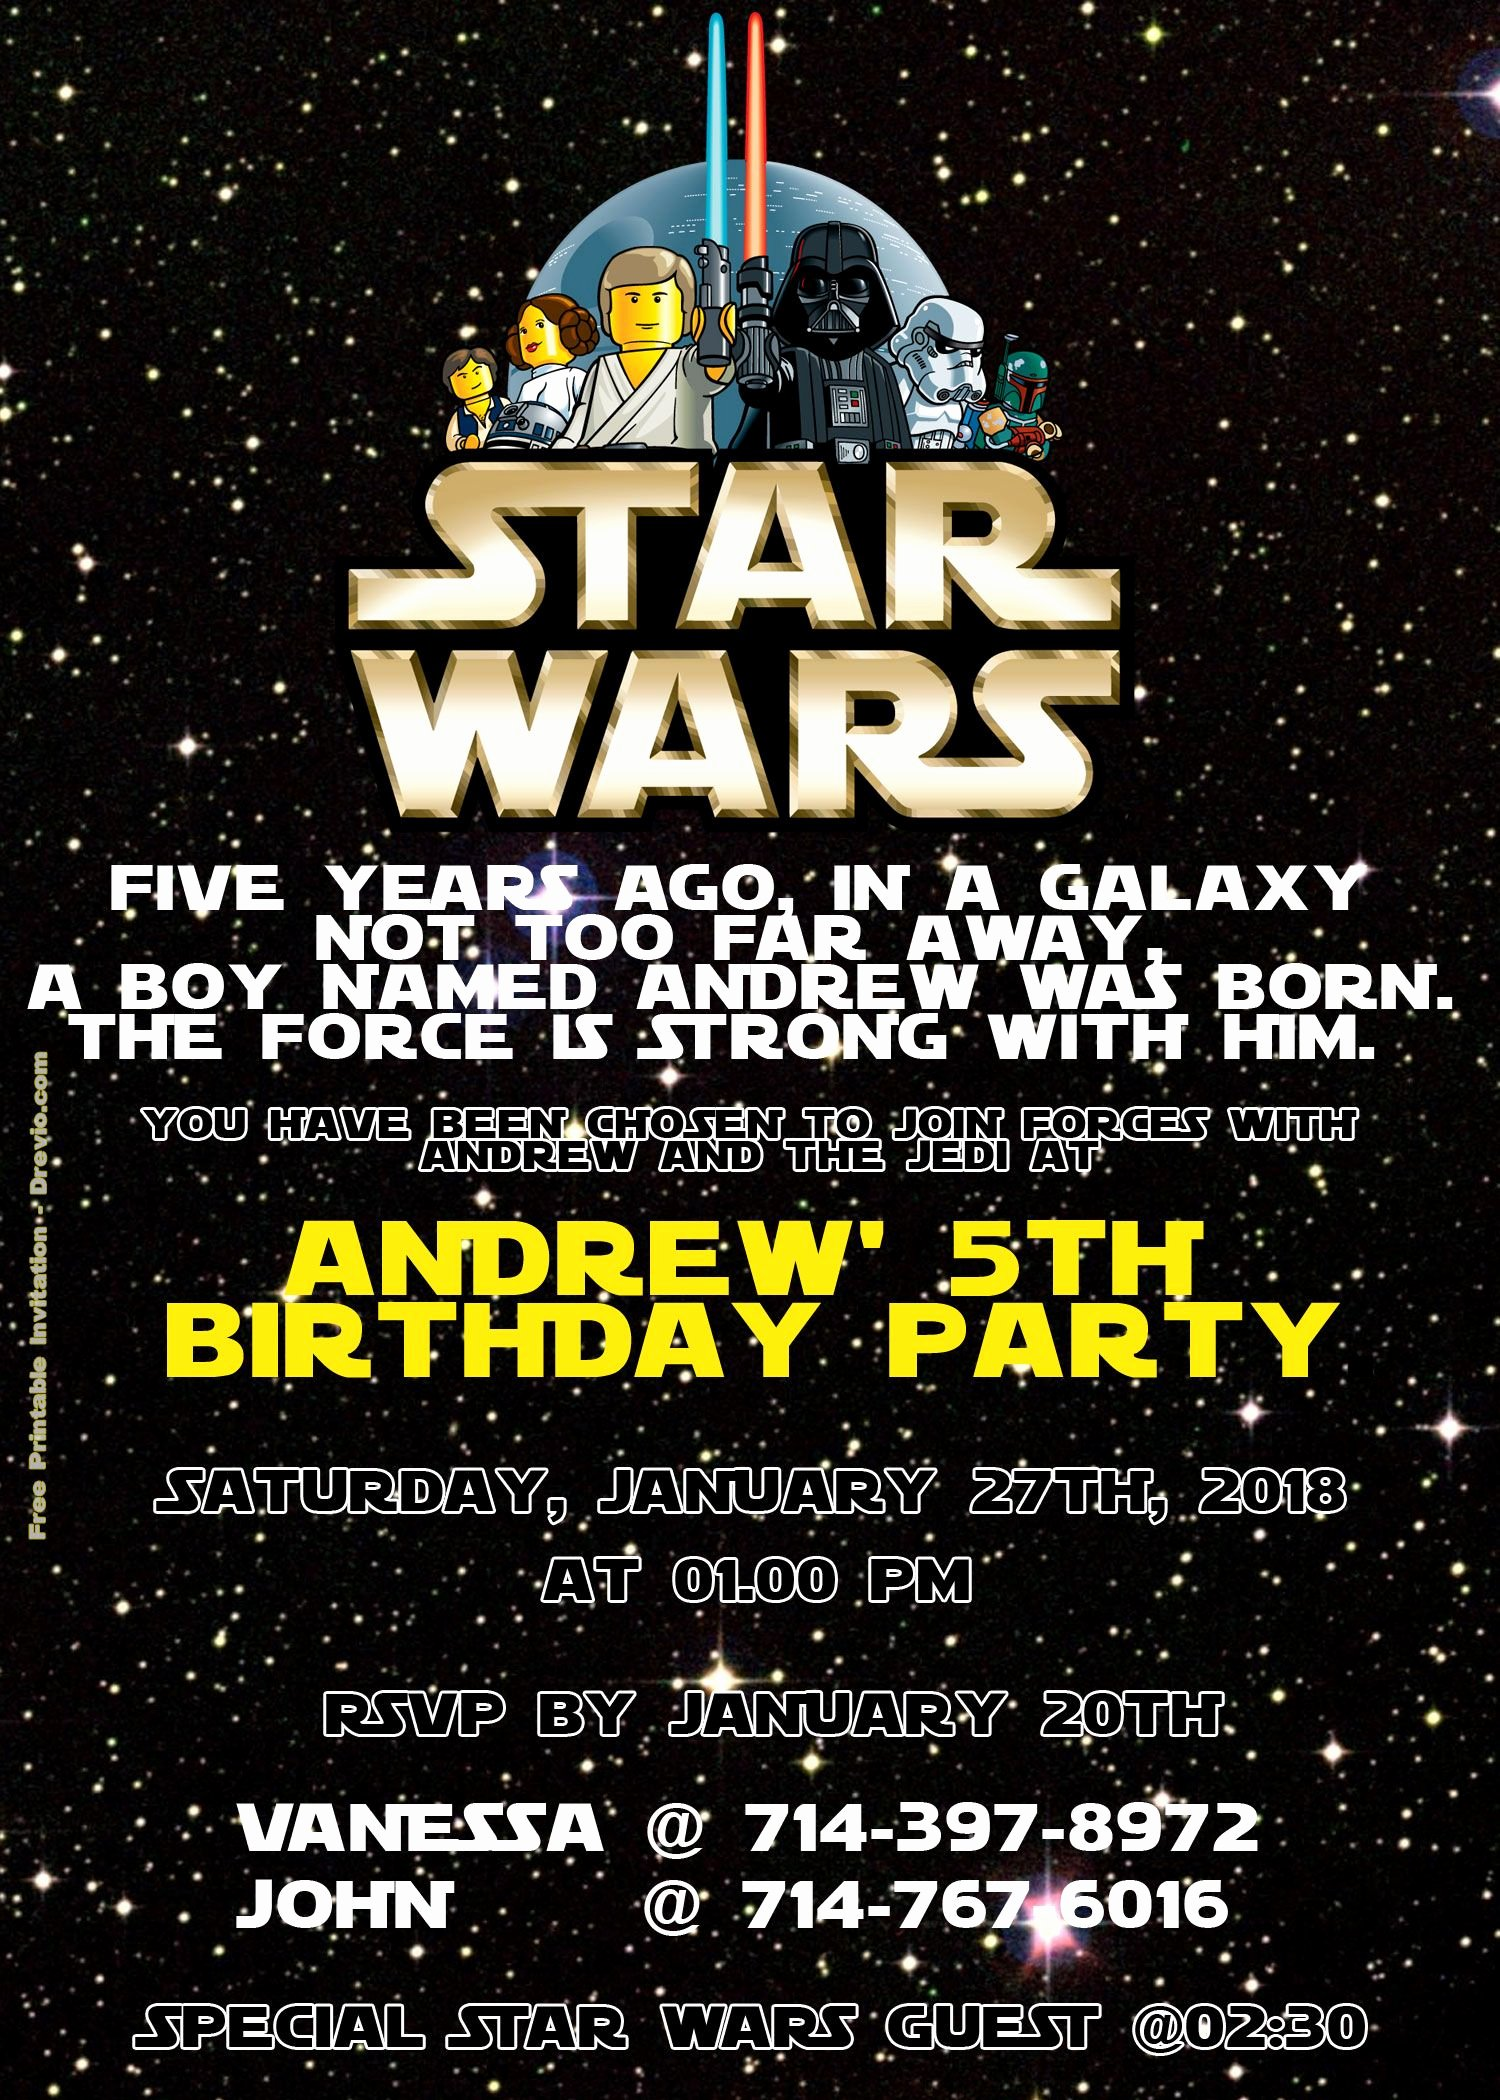 Lego Star Wars Party Invites New Free Lego Star Wars Birthday Invitation Psd